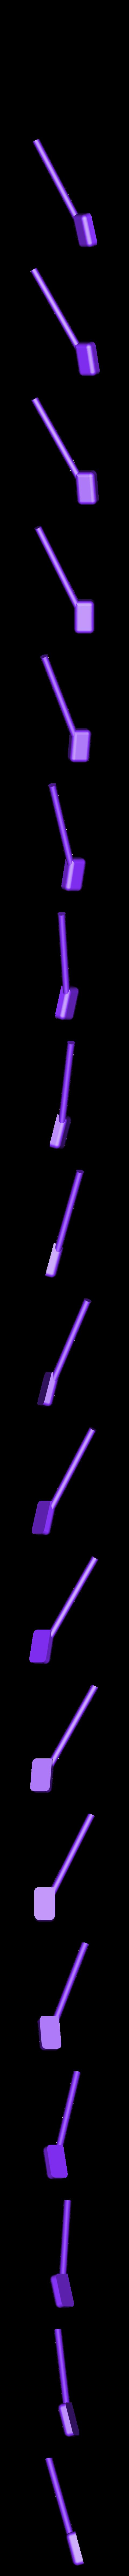 ducati spiegel-left.stl Download free STL file ducati monster 696 • Object to 3D print, jasperbaudoin